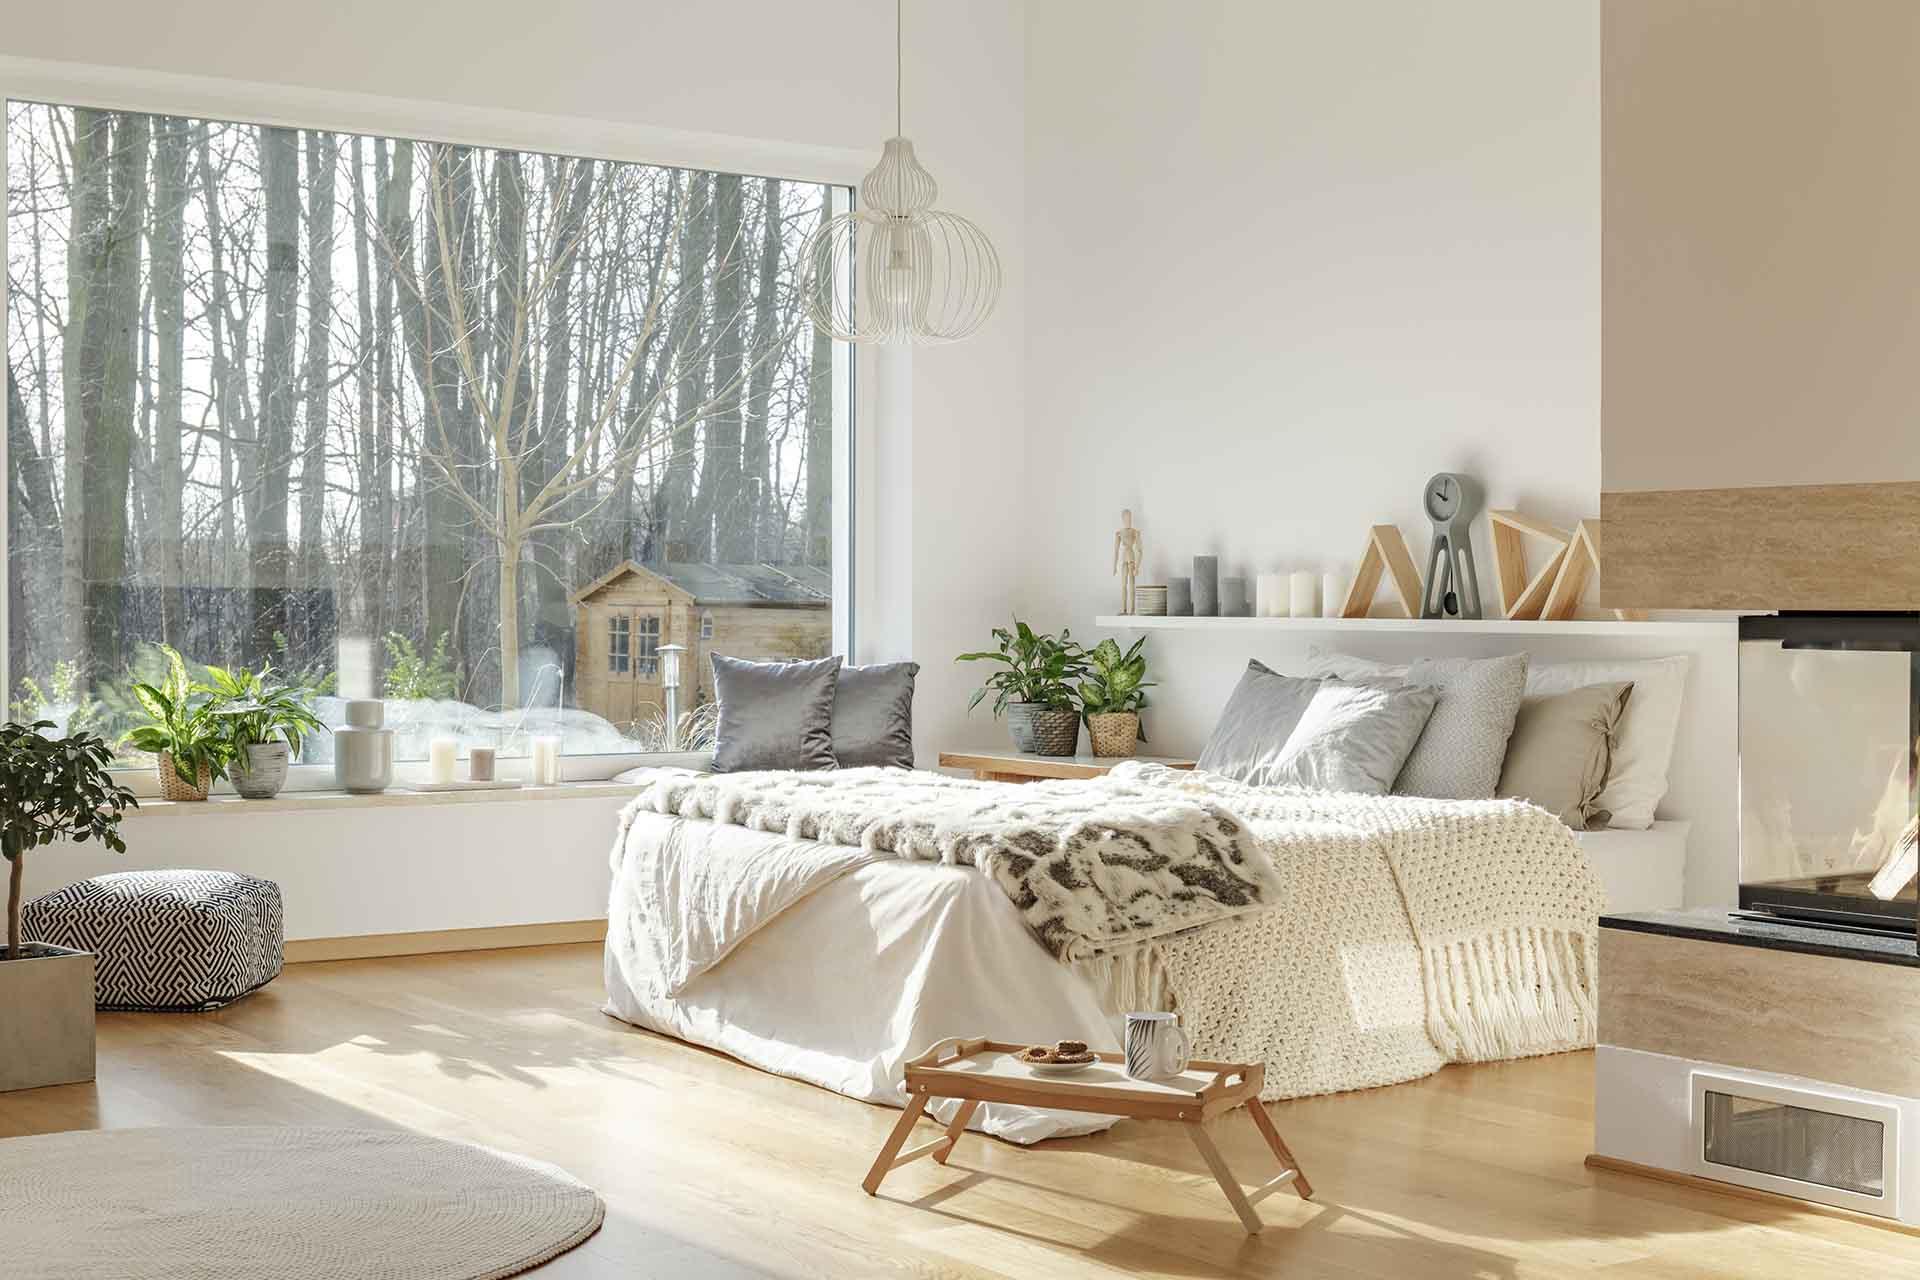 5 best window styles for amazing views